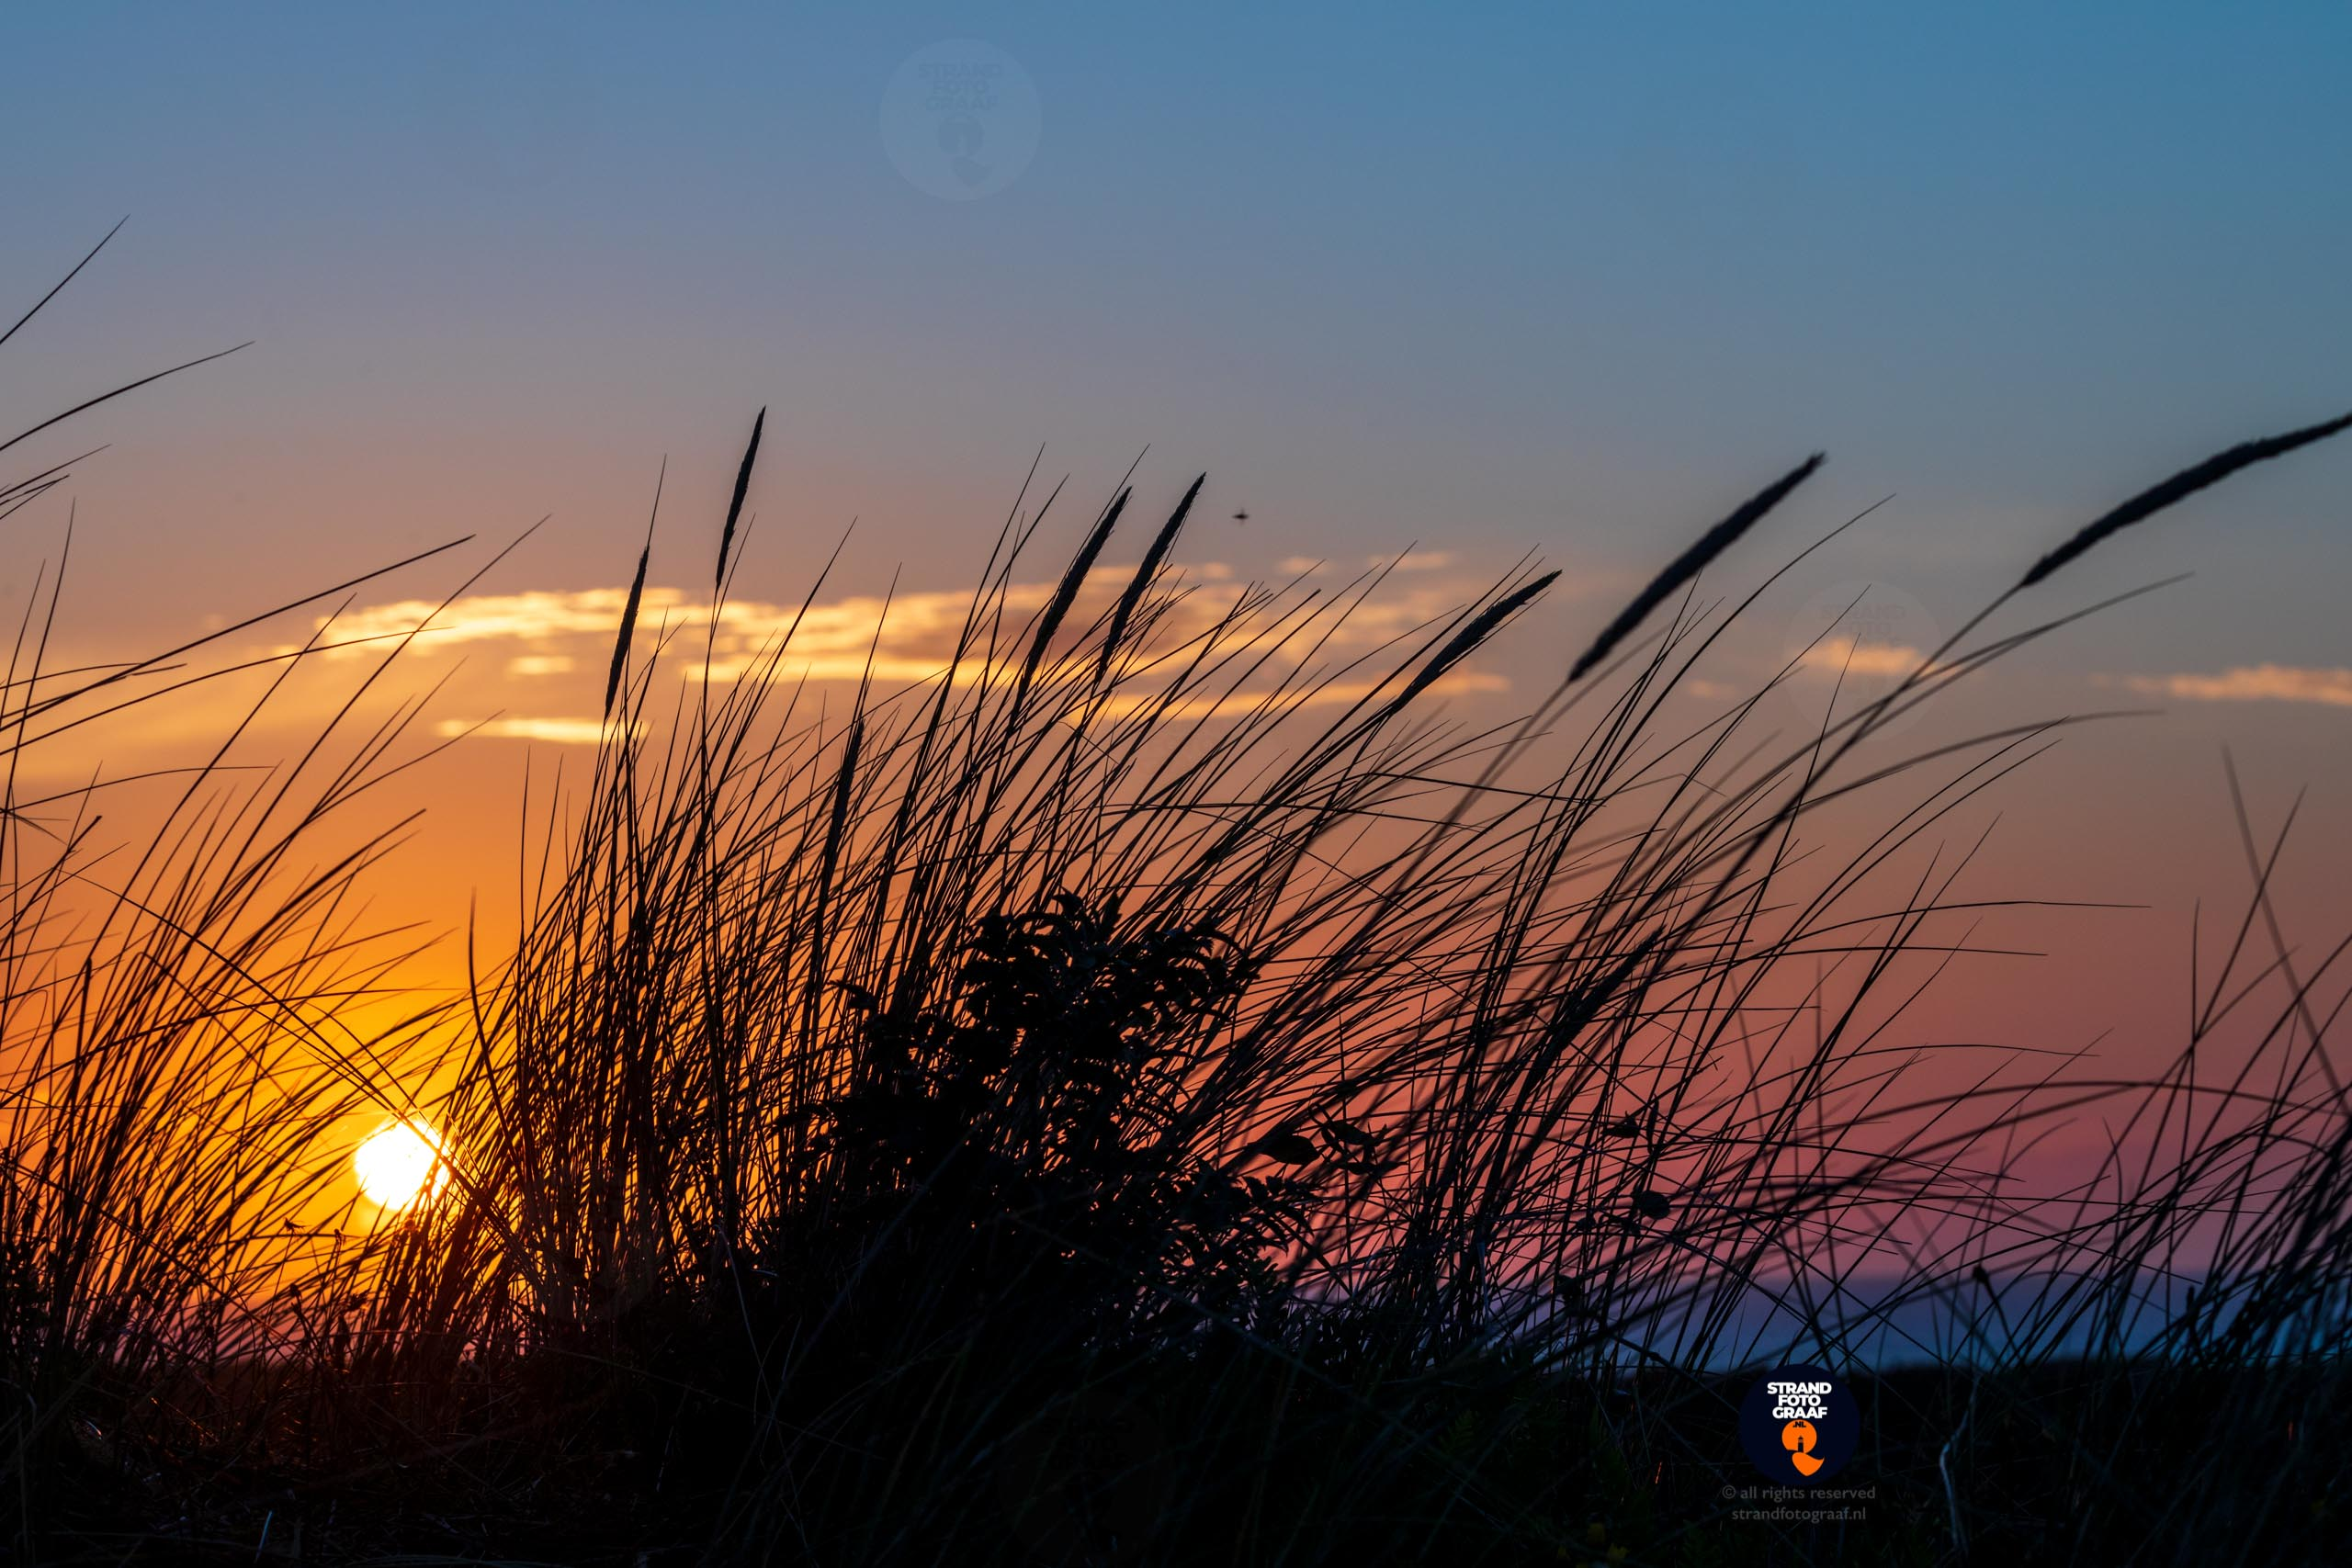 Helmgras bij zonsondergang - Strandfotograaf